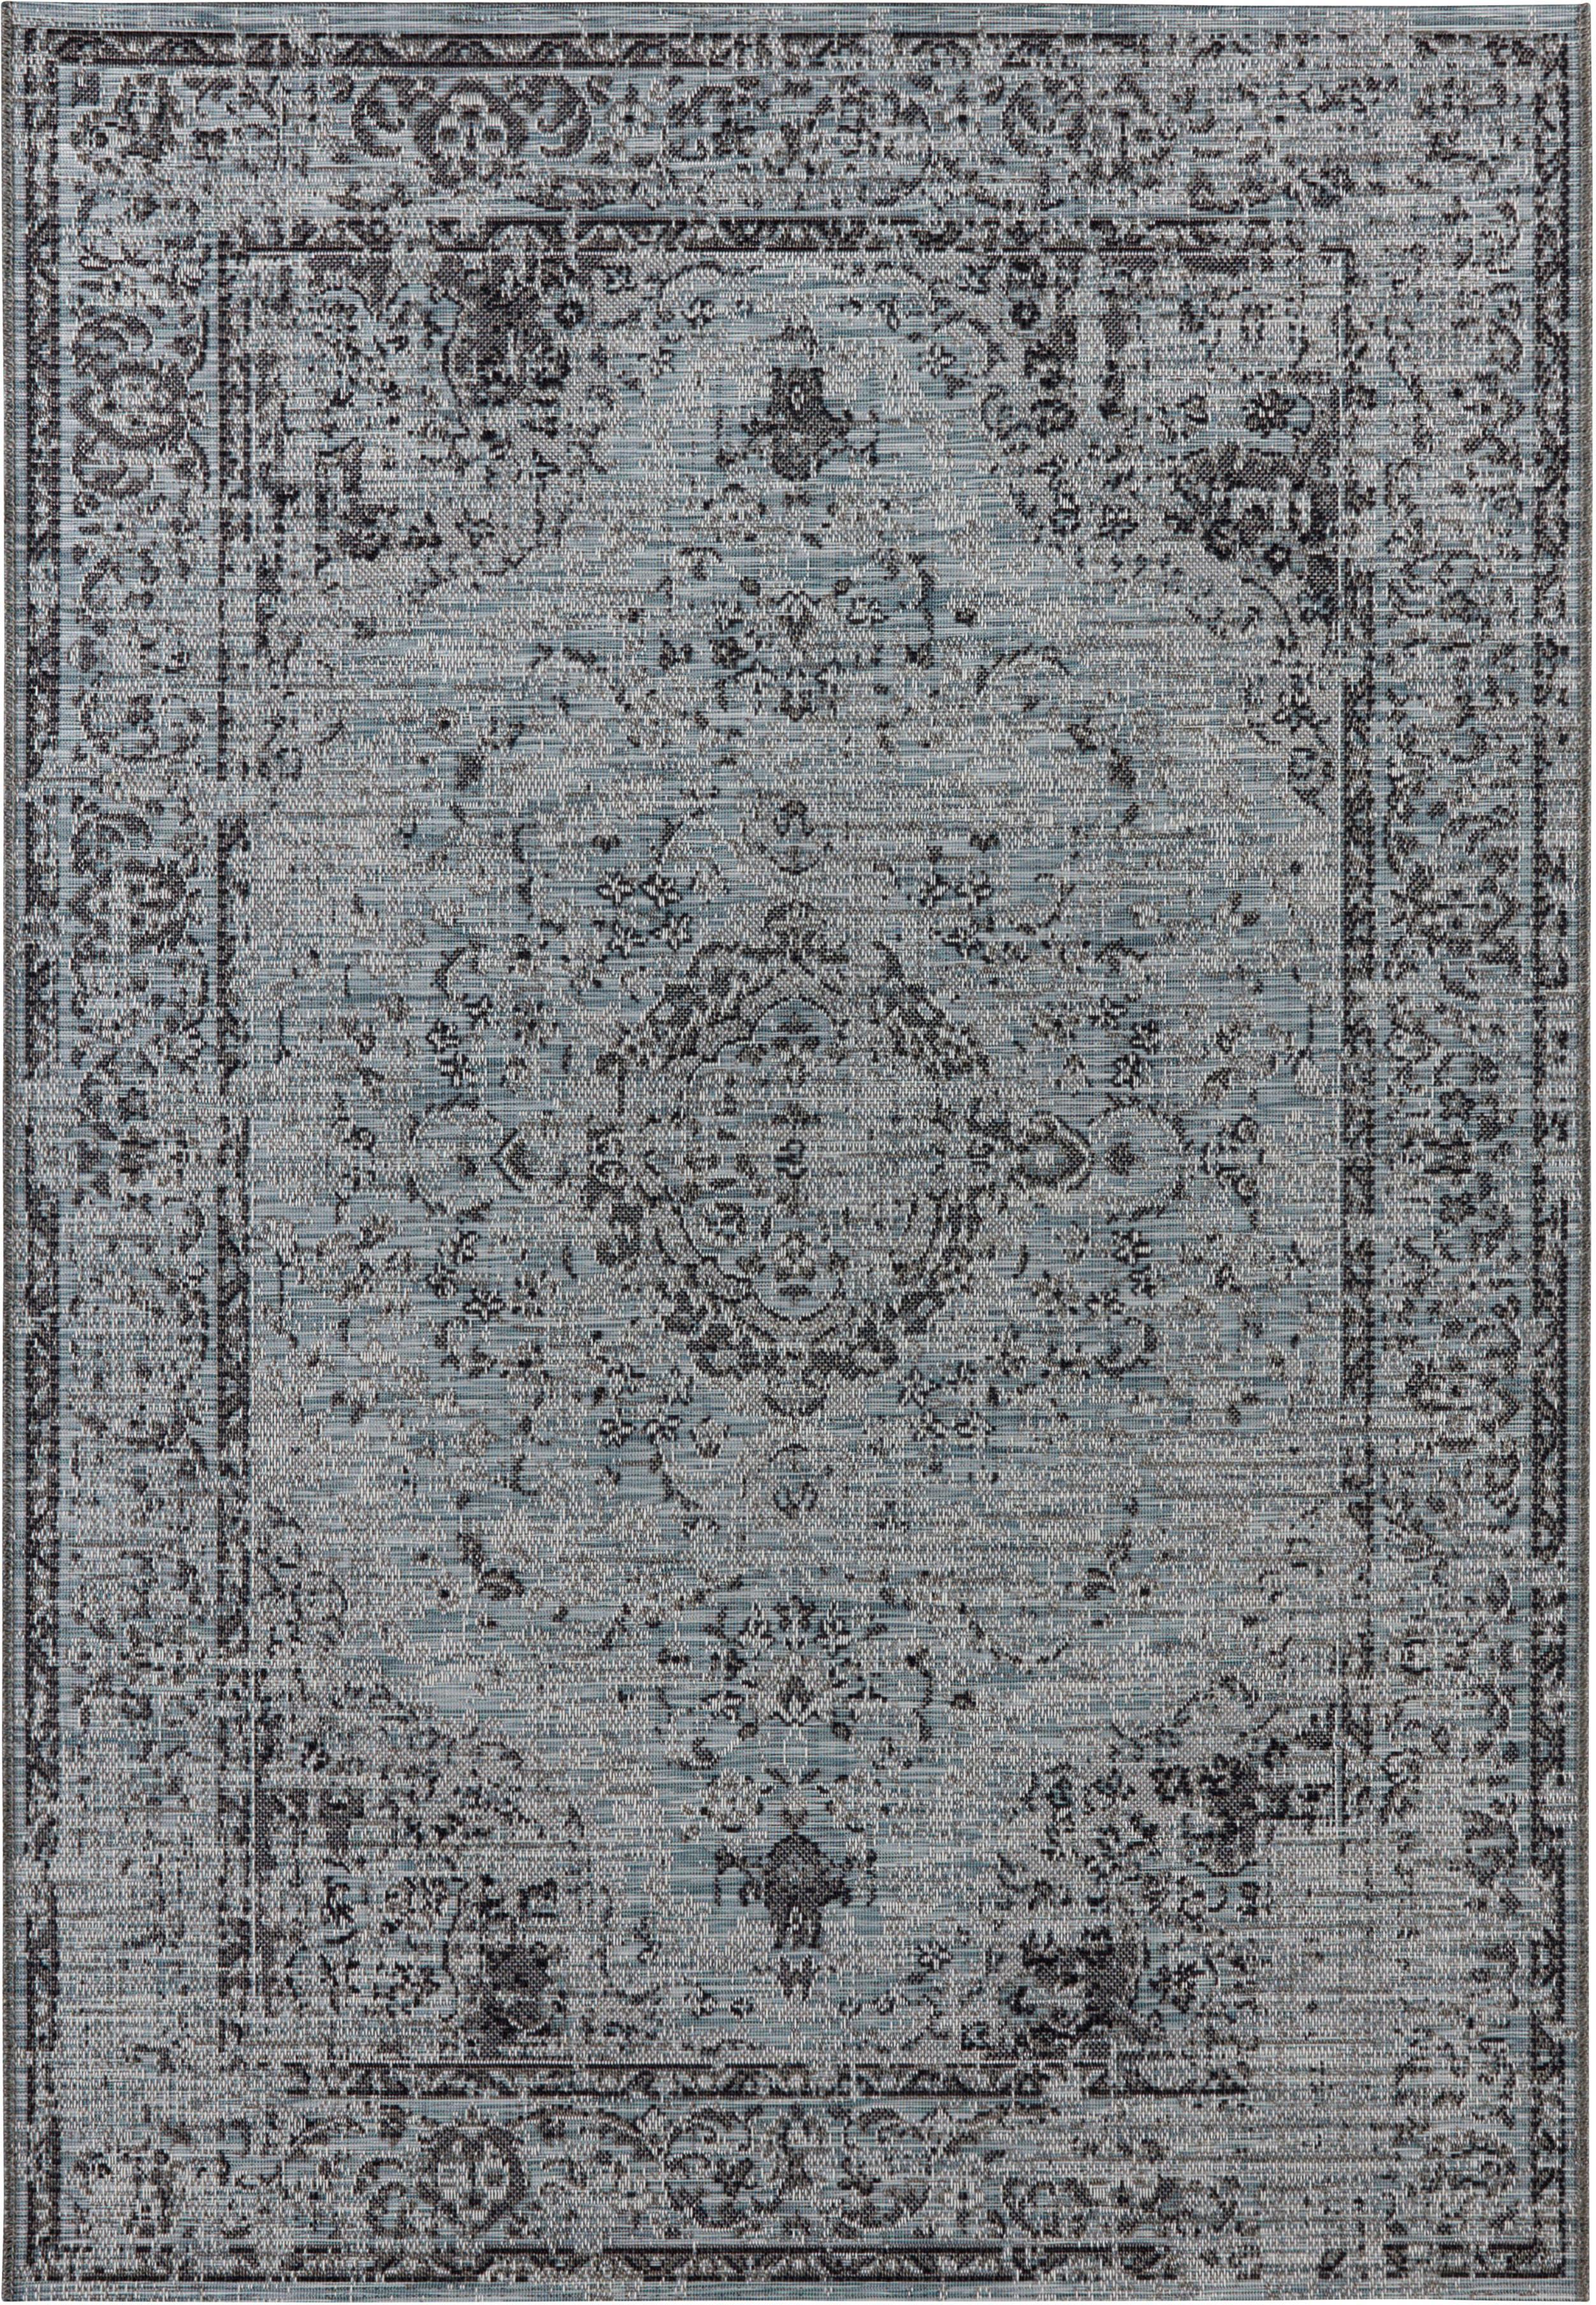 Teppich Cenon ELLE Decor rechteckig Höhe 3 mm maschinell gewebt